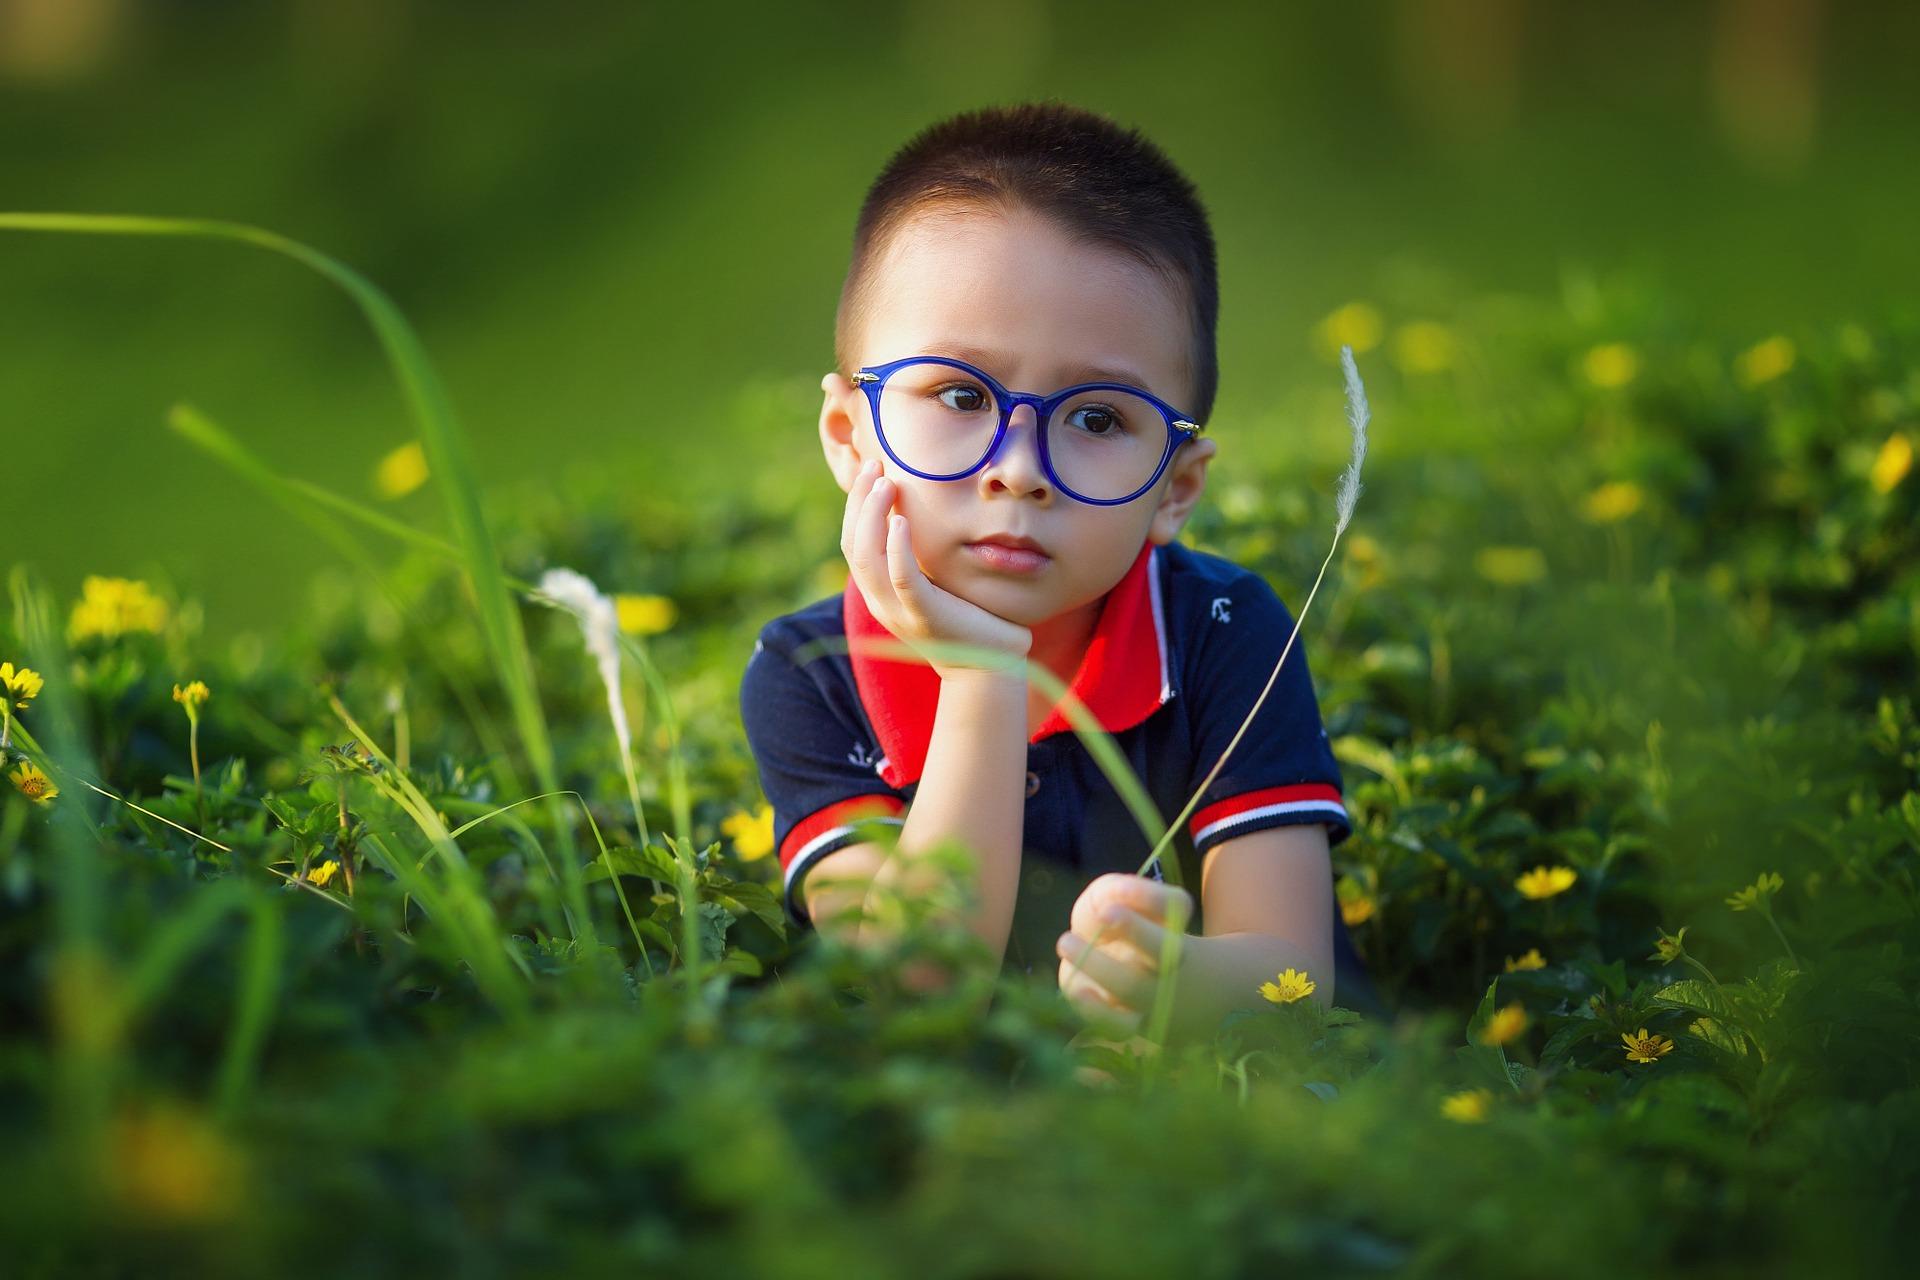 dziecko, łąka, natura.